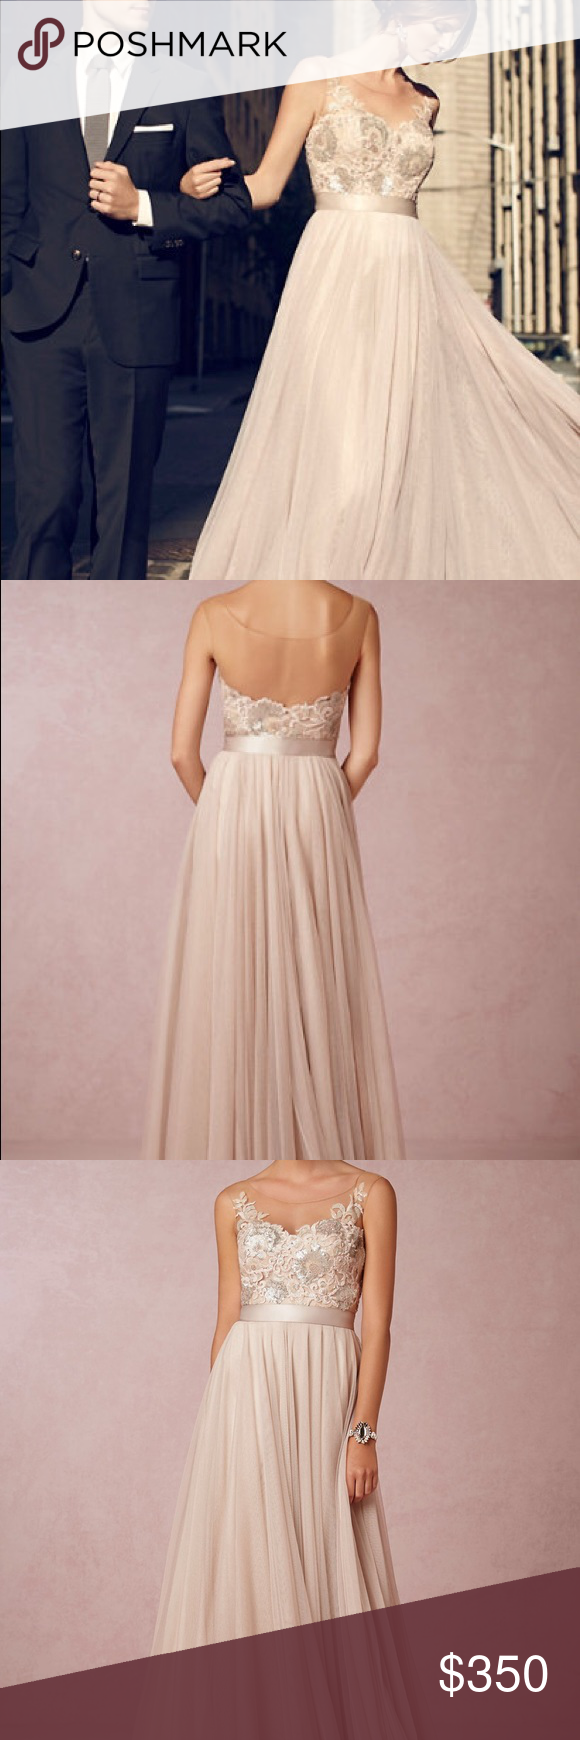 4c3a215f016d Lucca Maxi Antique Rose Wedding Dress Beautiful antique rose wedding  dress...no alterations. Watters Dresses Wedding